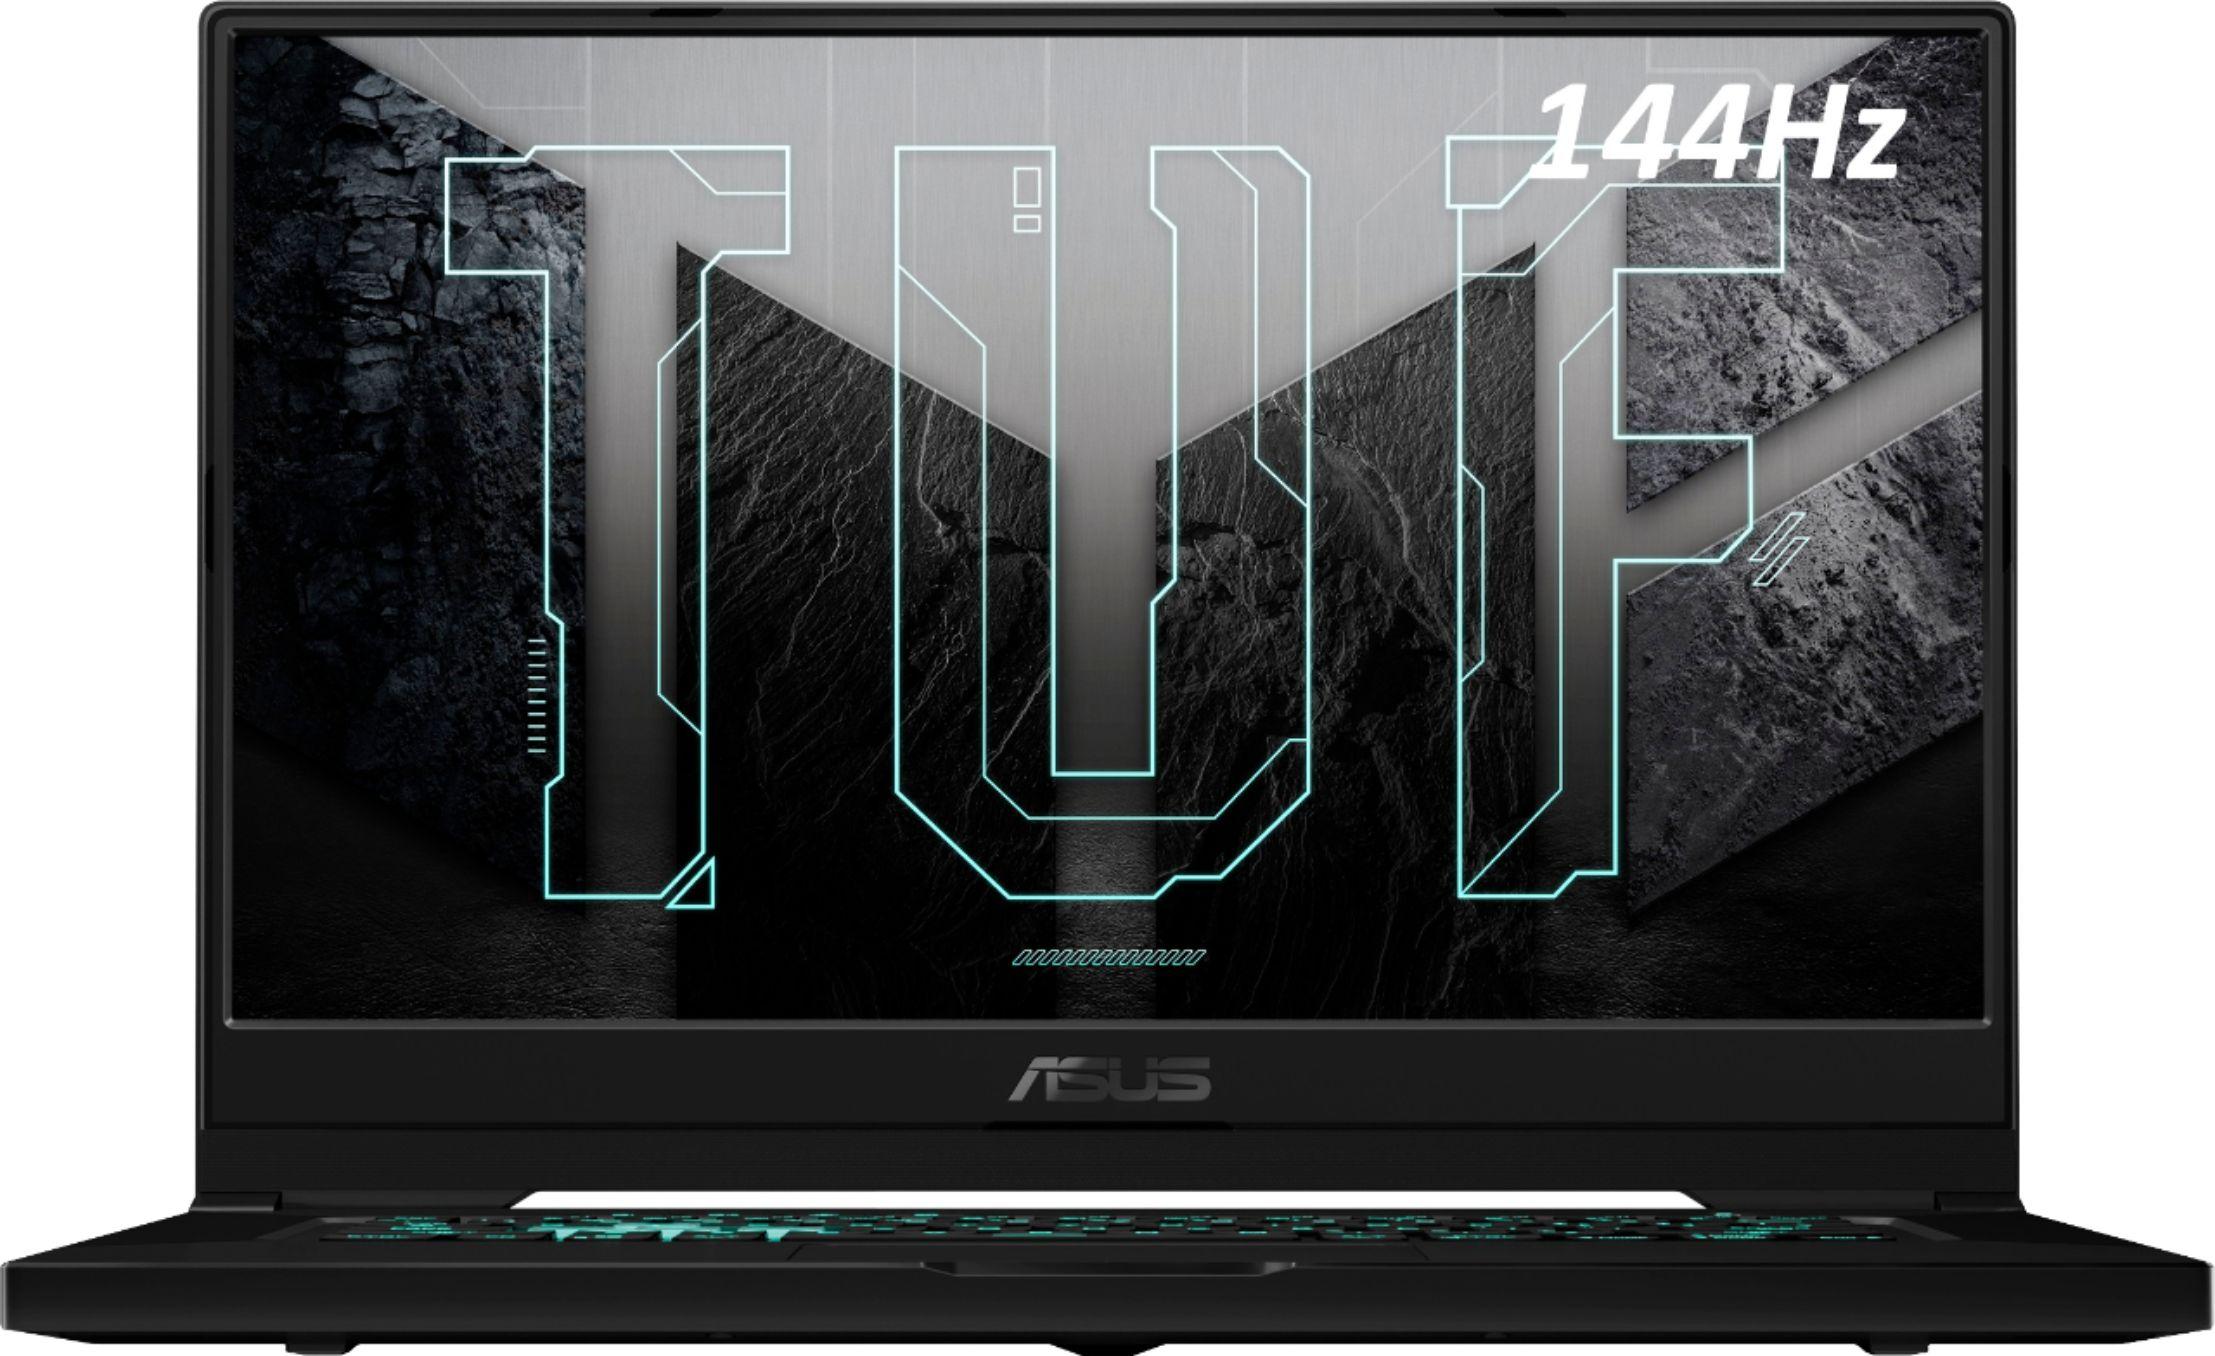 "ASUS TUF DASH 15.6"" Gaming Laptop Intel 11th Gen i7 16GB Memory NVIDIA GeForce RTX 3060 512GB SSD Eclipse Grey Eclipse Grey FX516PM-211.TF15 - Best Buy $1149.99"